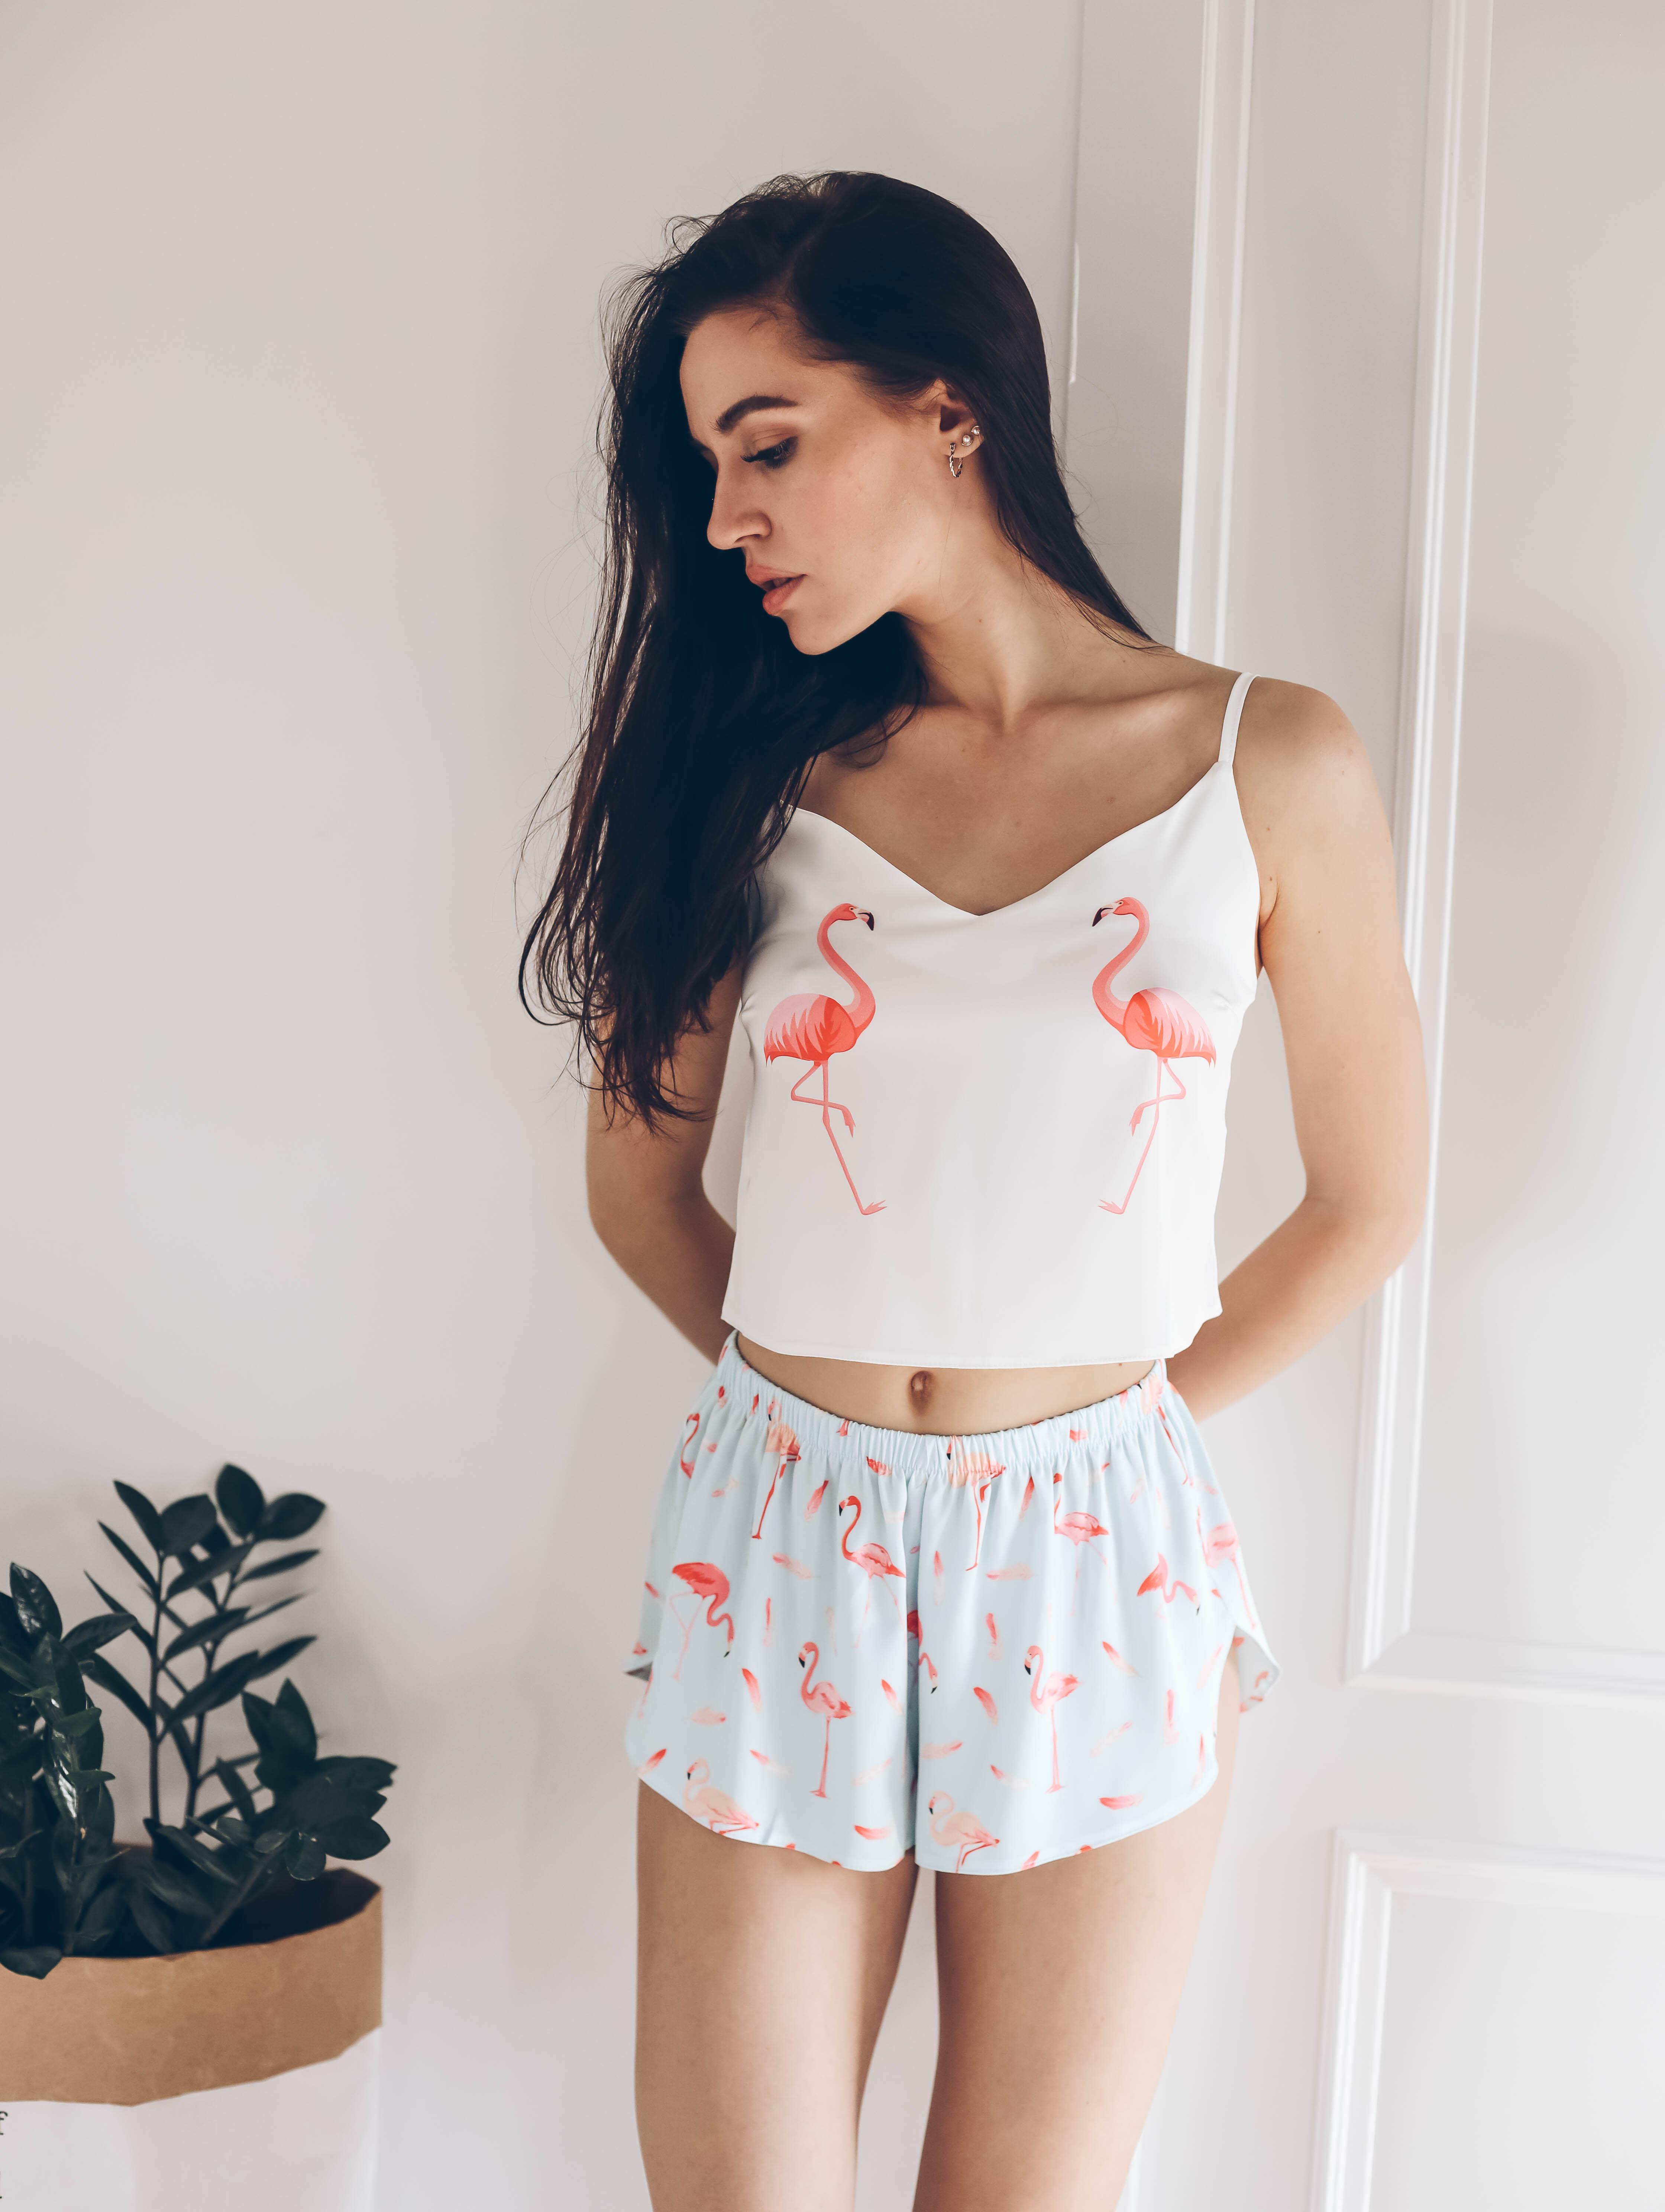 Шелковая пижама Фламинго